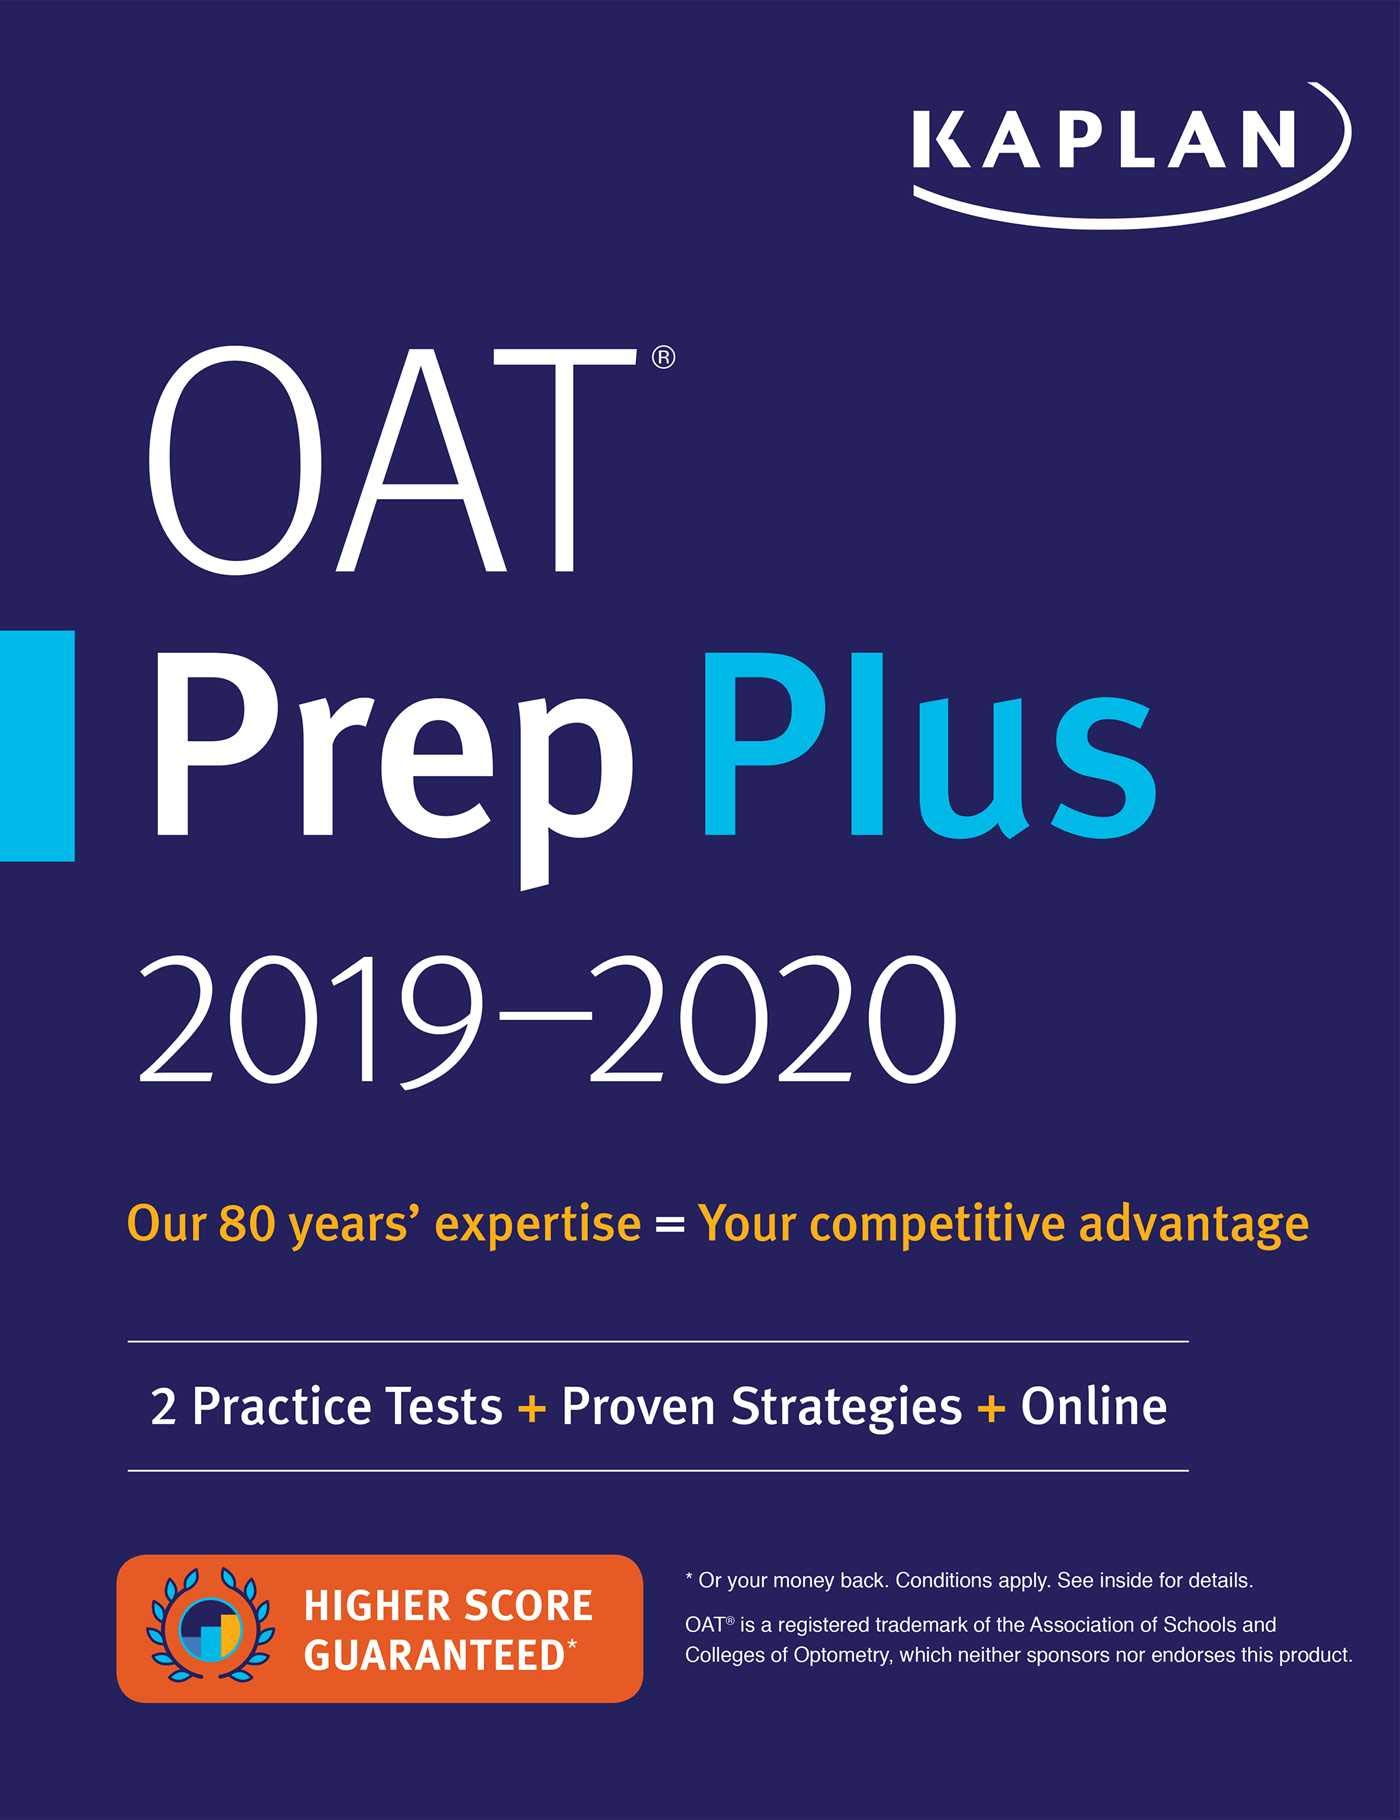 OAT Prep Plus 2019-2020: 2 Practice Tests + Proven Strategies + Online (Kaplan Test Prep) by Kaplan Publishing